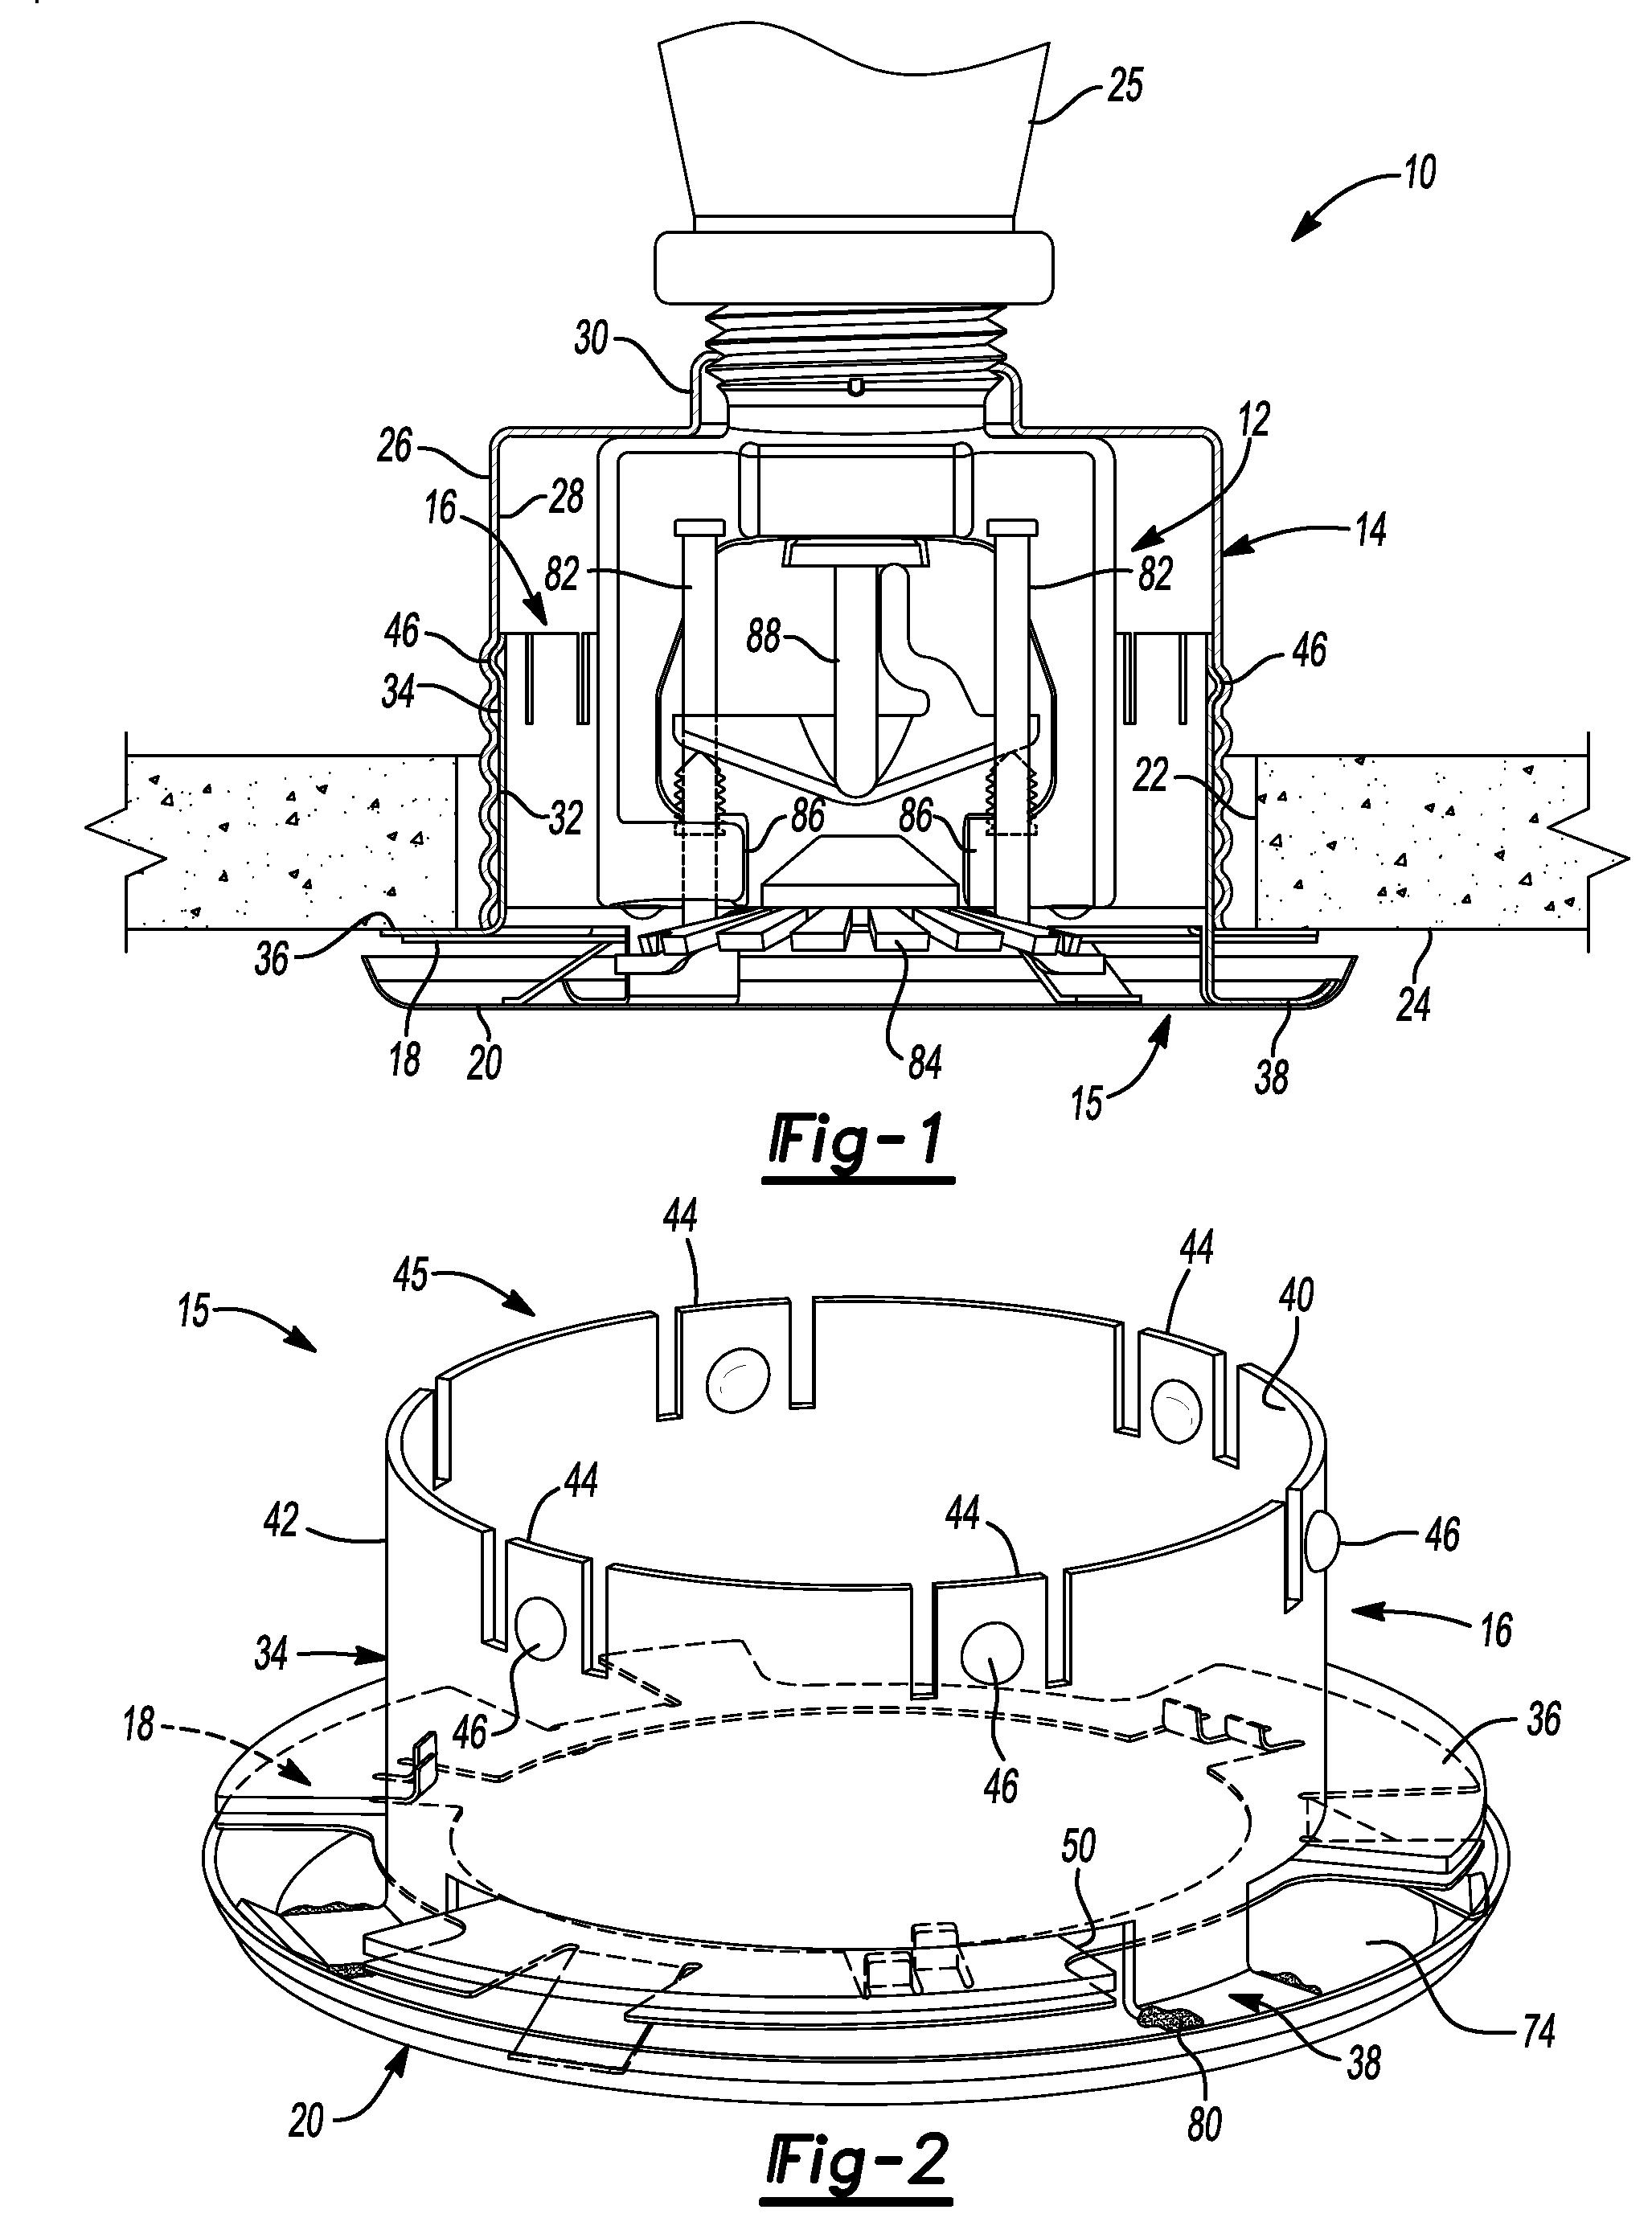 fire sprinkler diagram